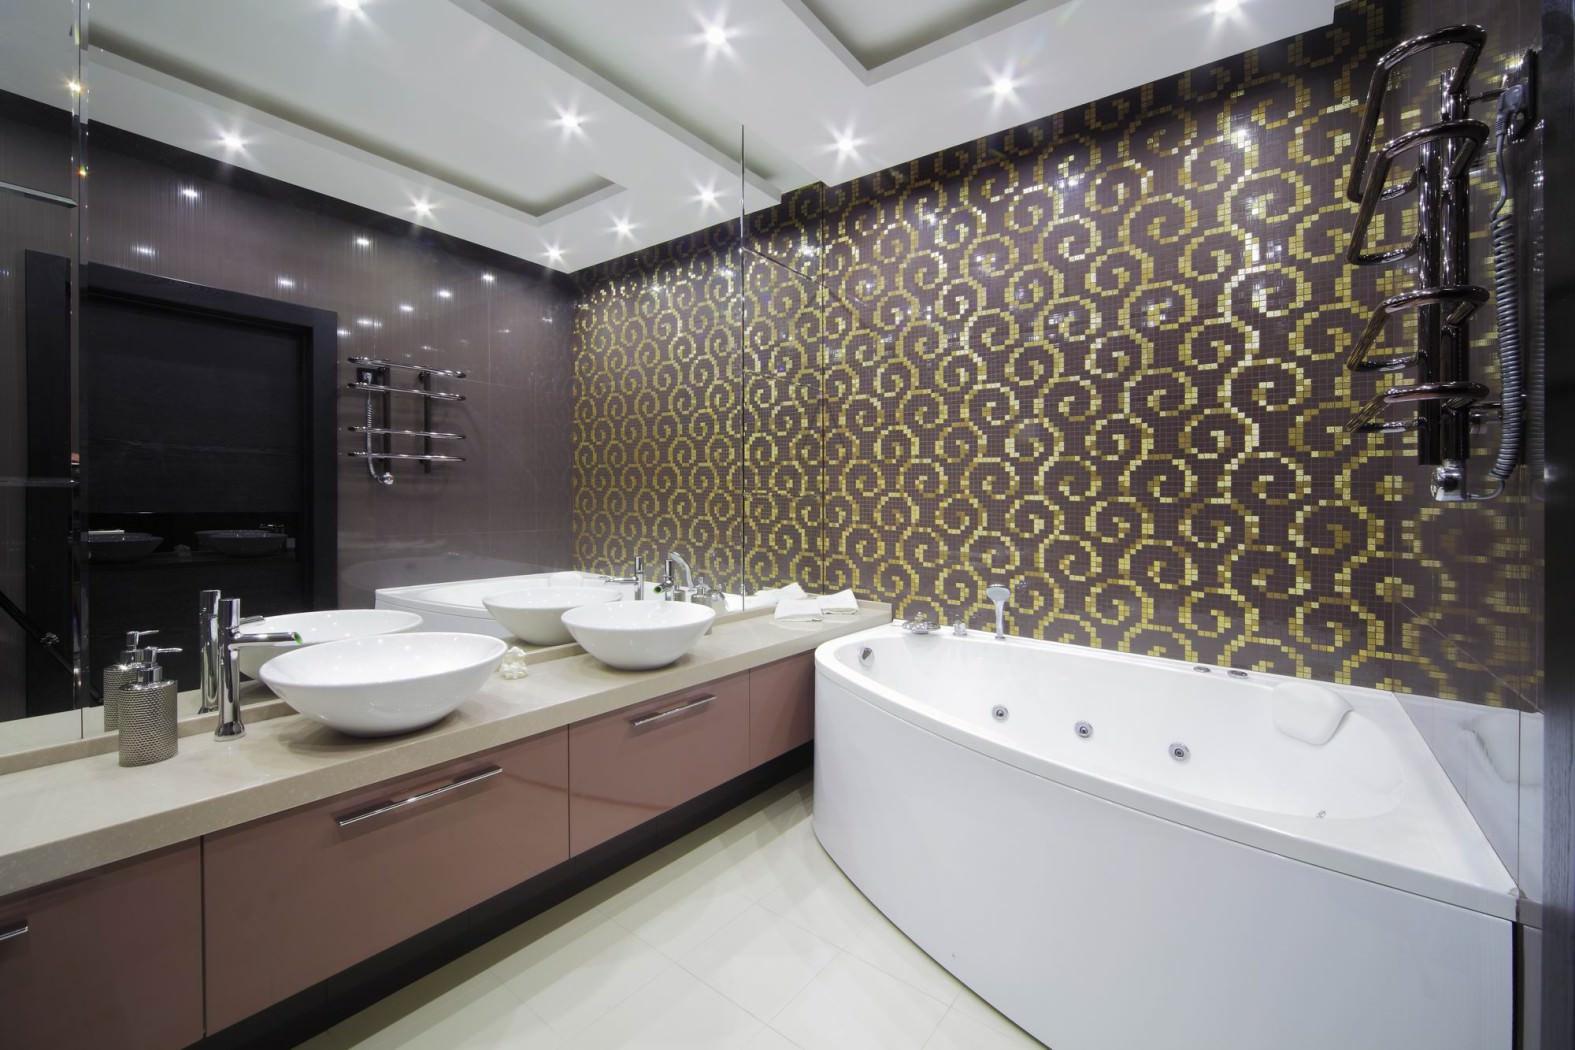 moroshka ванная комната